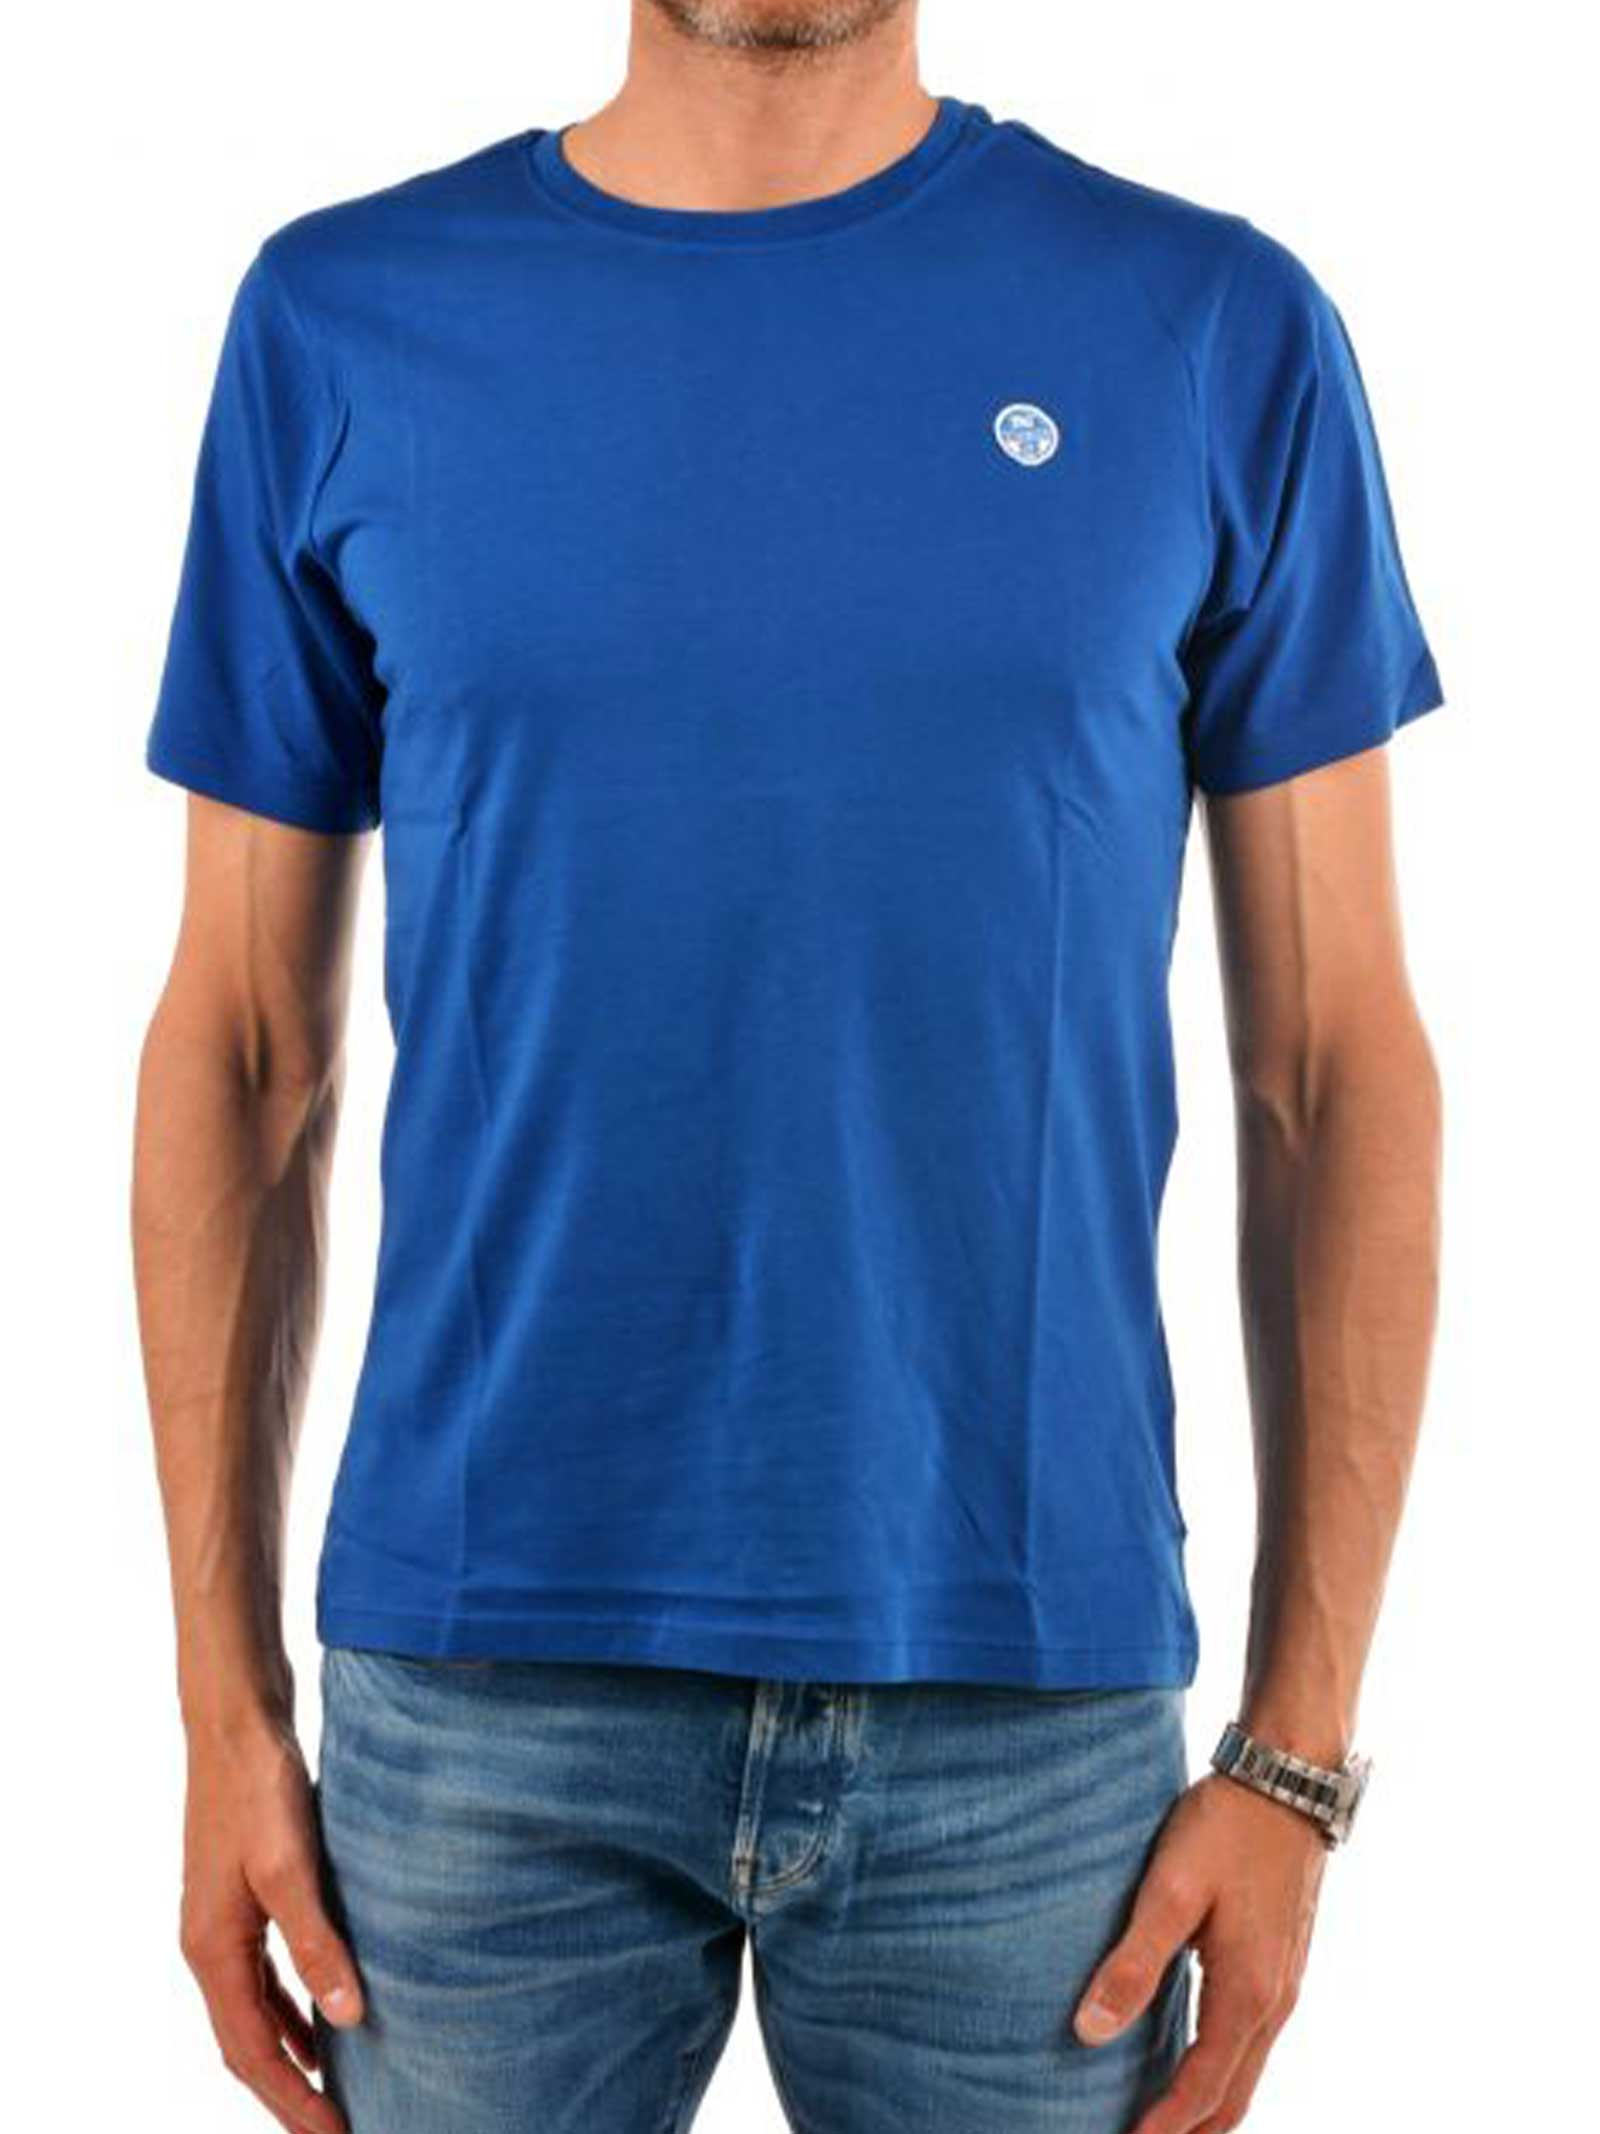 T-SHIRT UOMO NORTH SAILS   T-shirt   6925300790